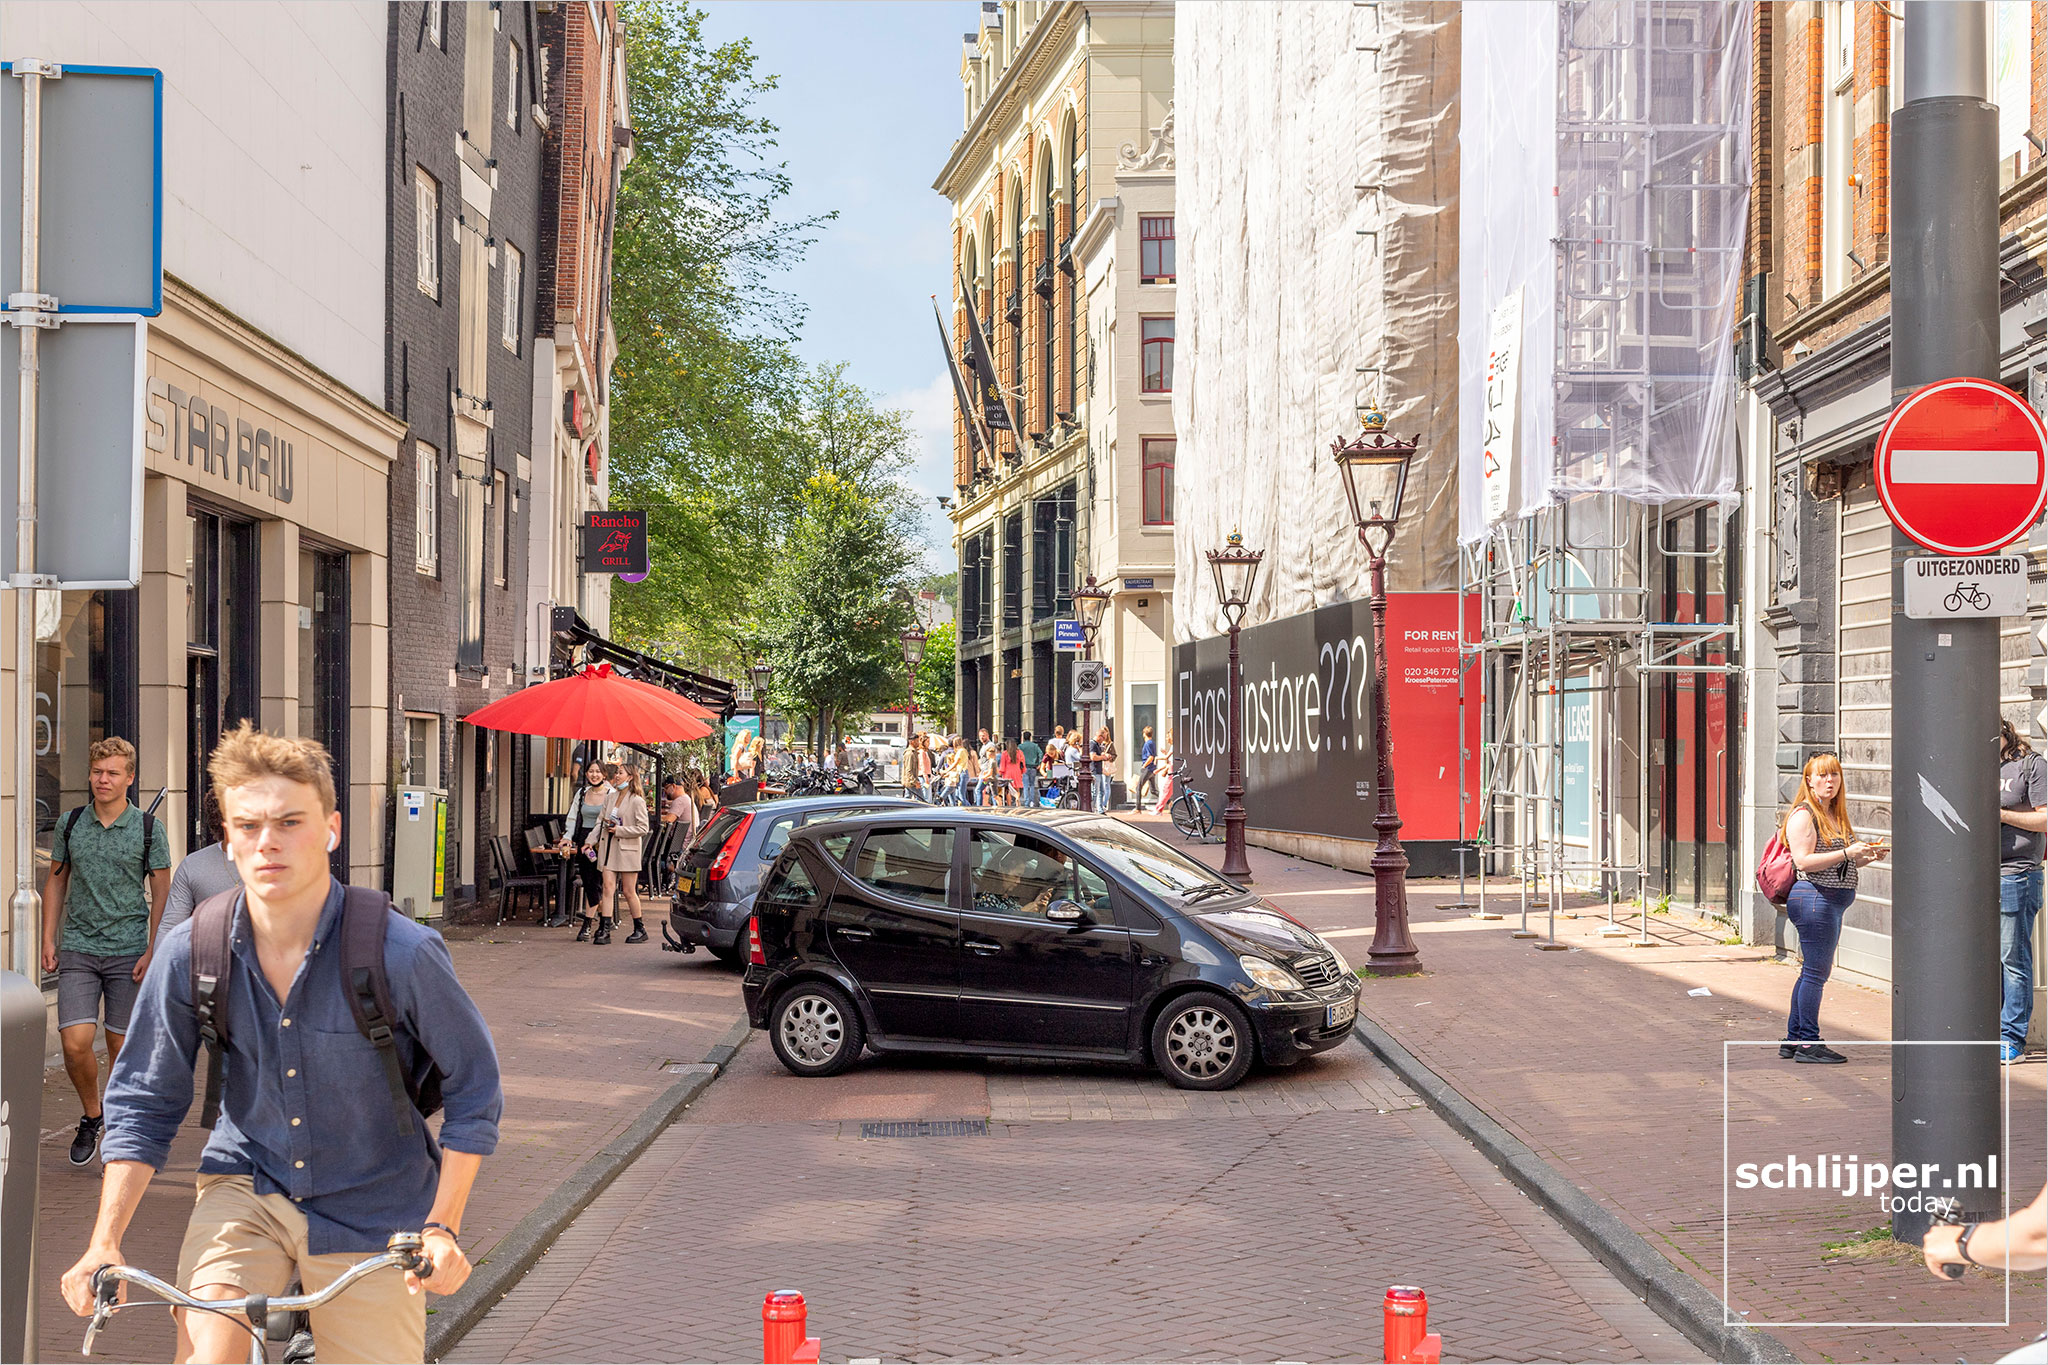 The Netherlands, Amsterdam, 24 augustus 2021